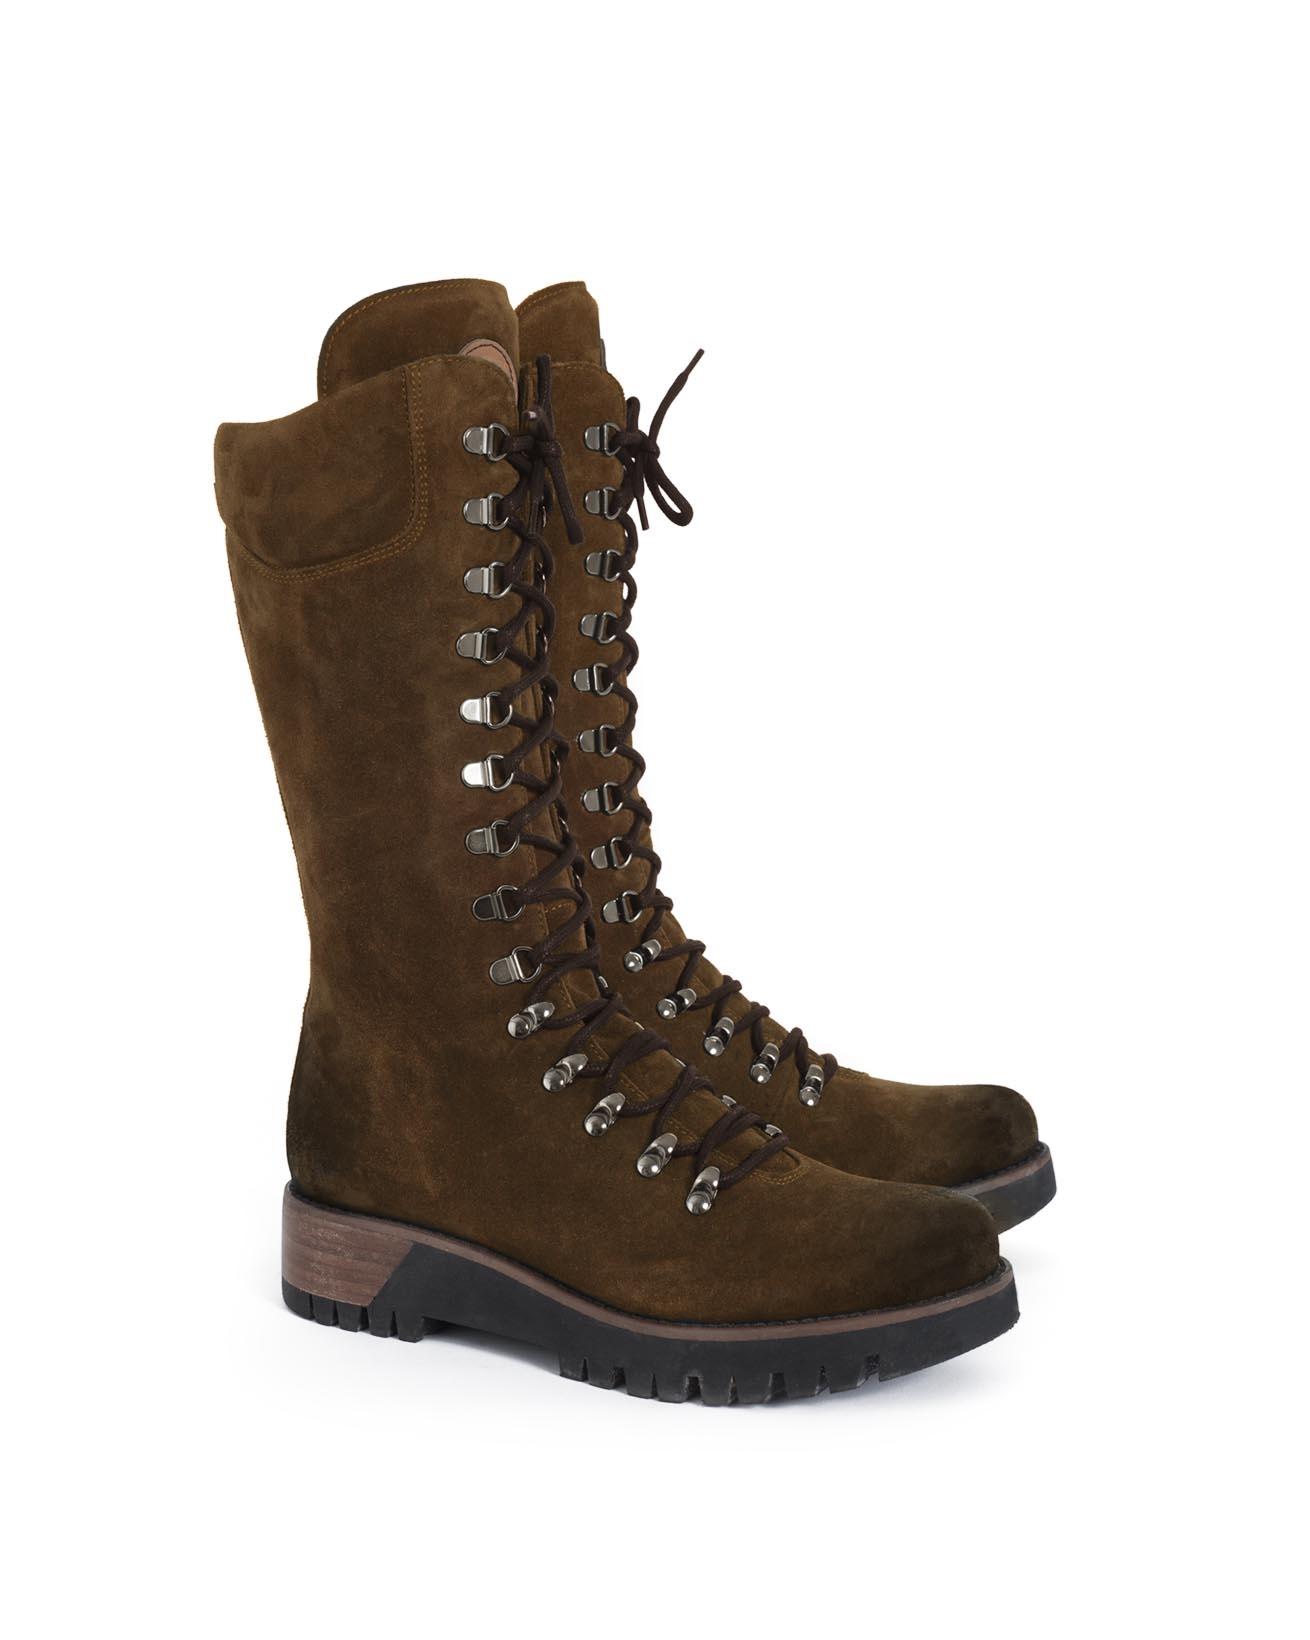 Wilderness Boots - Size 40 - Cinnamon - 1148